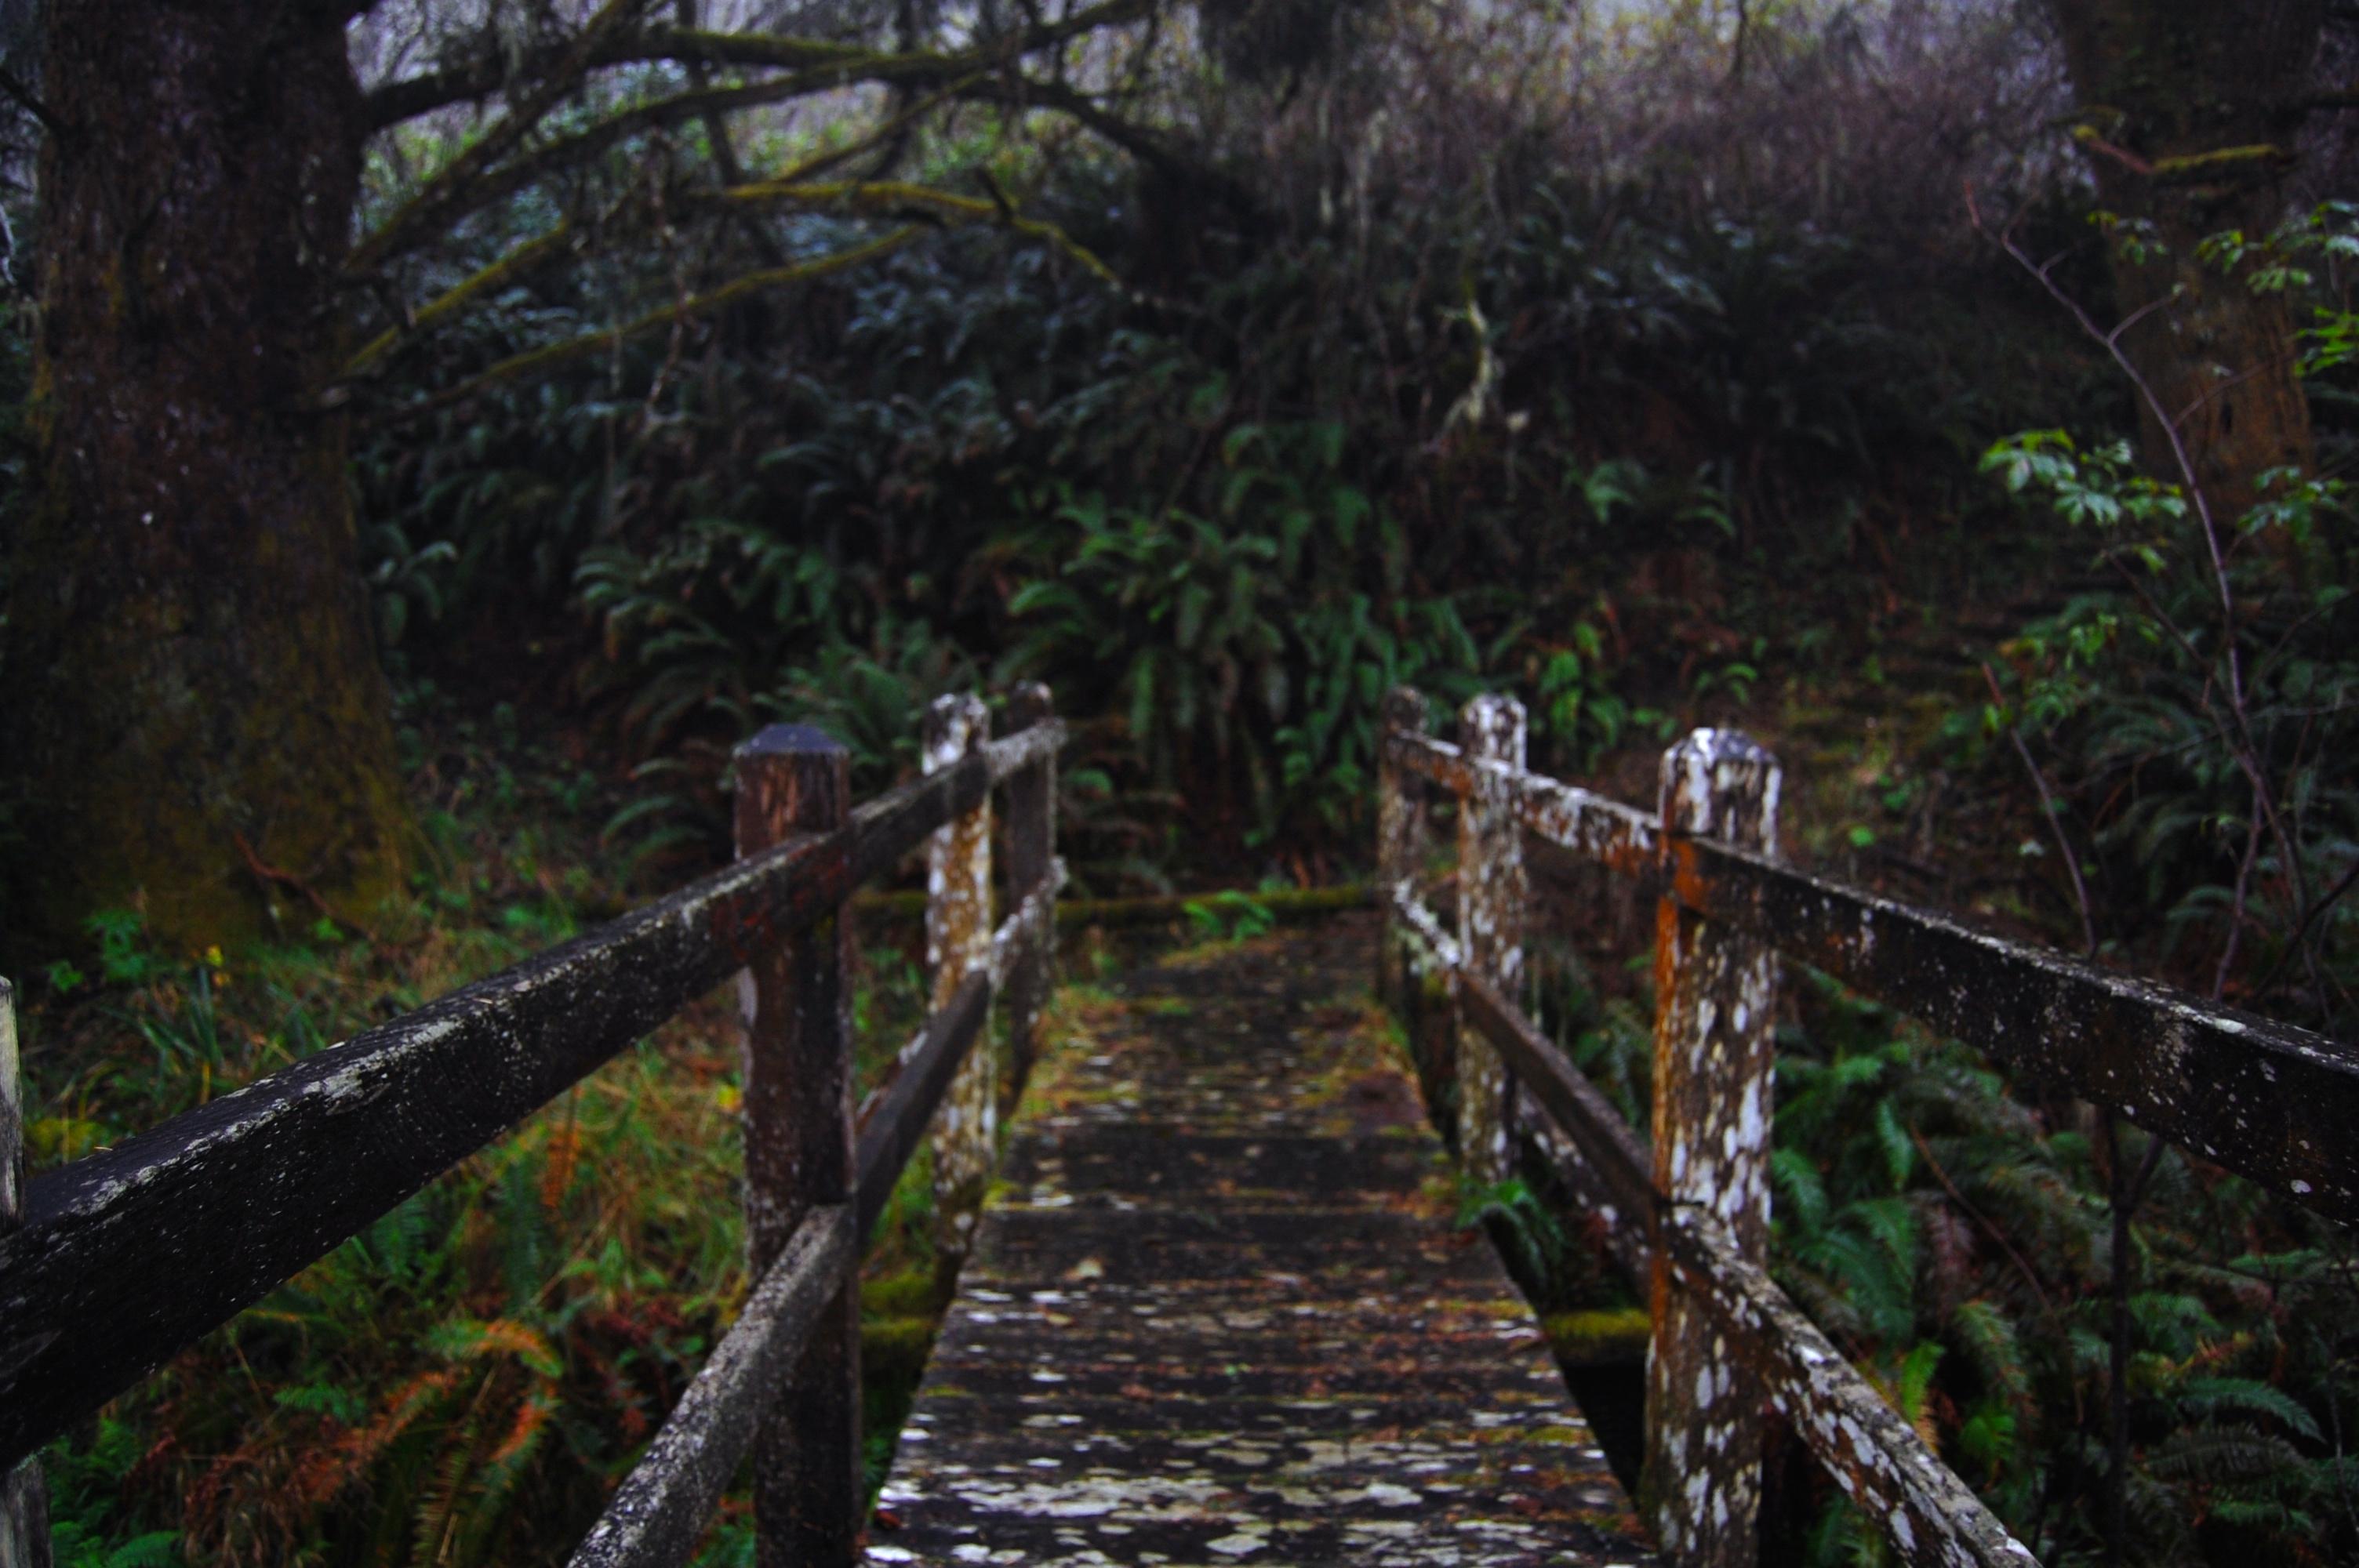 Bridge and ferns